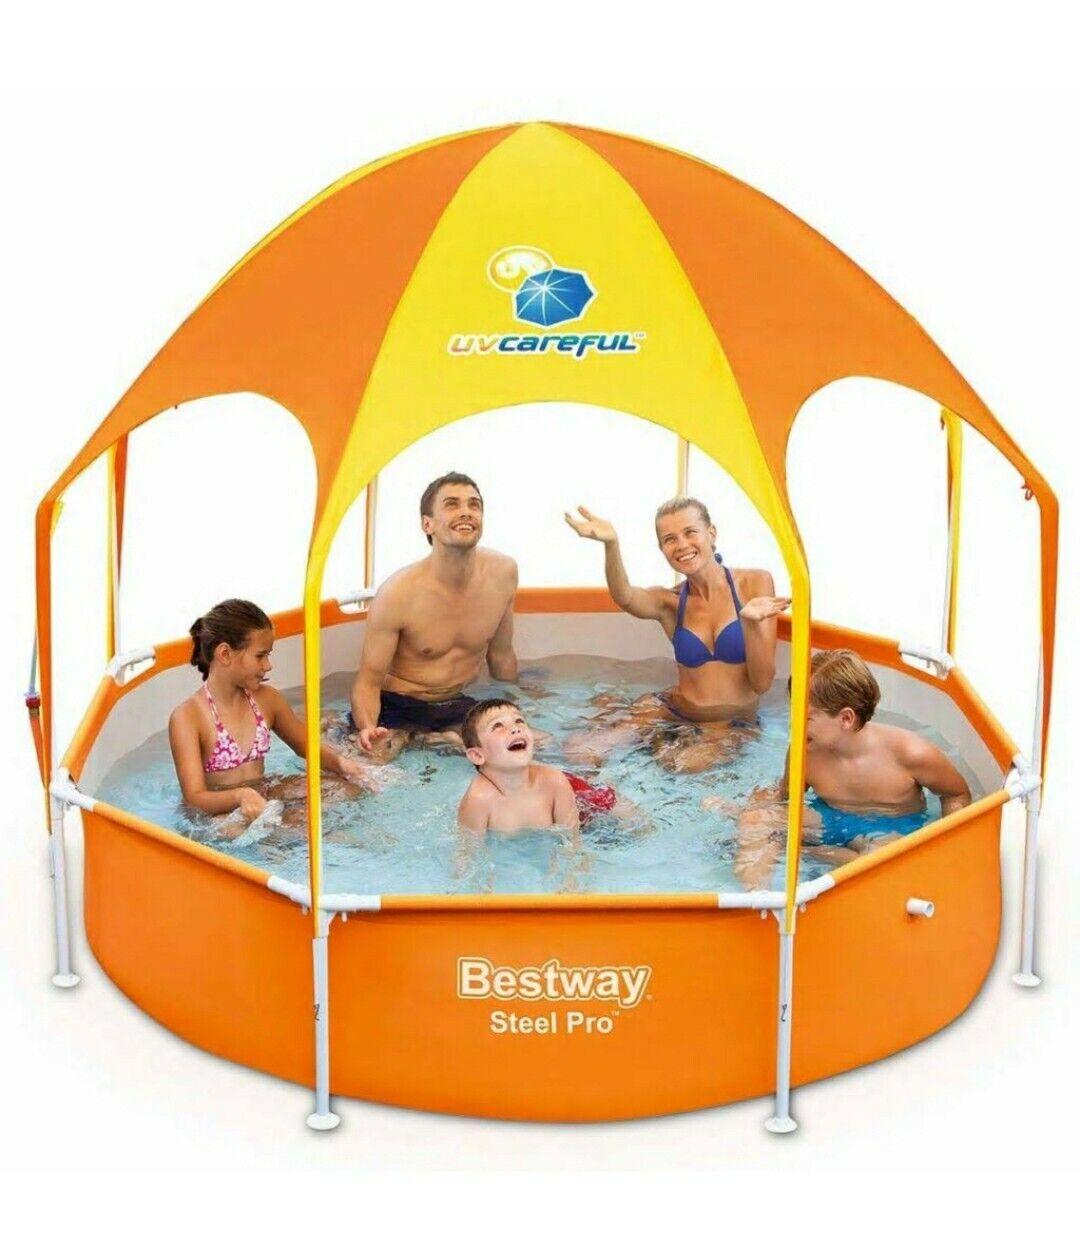 Bestway Splash in Shade Play Pool BLACK FIBERGLASS POLE 8Ft Part 56432 P61080